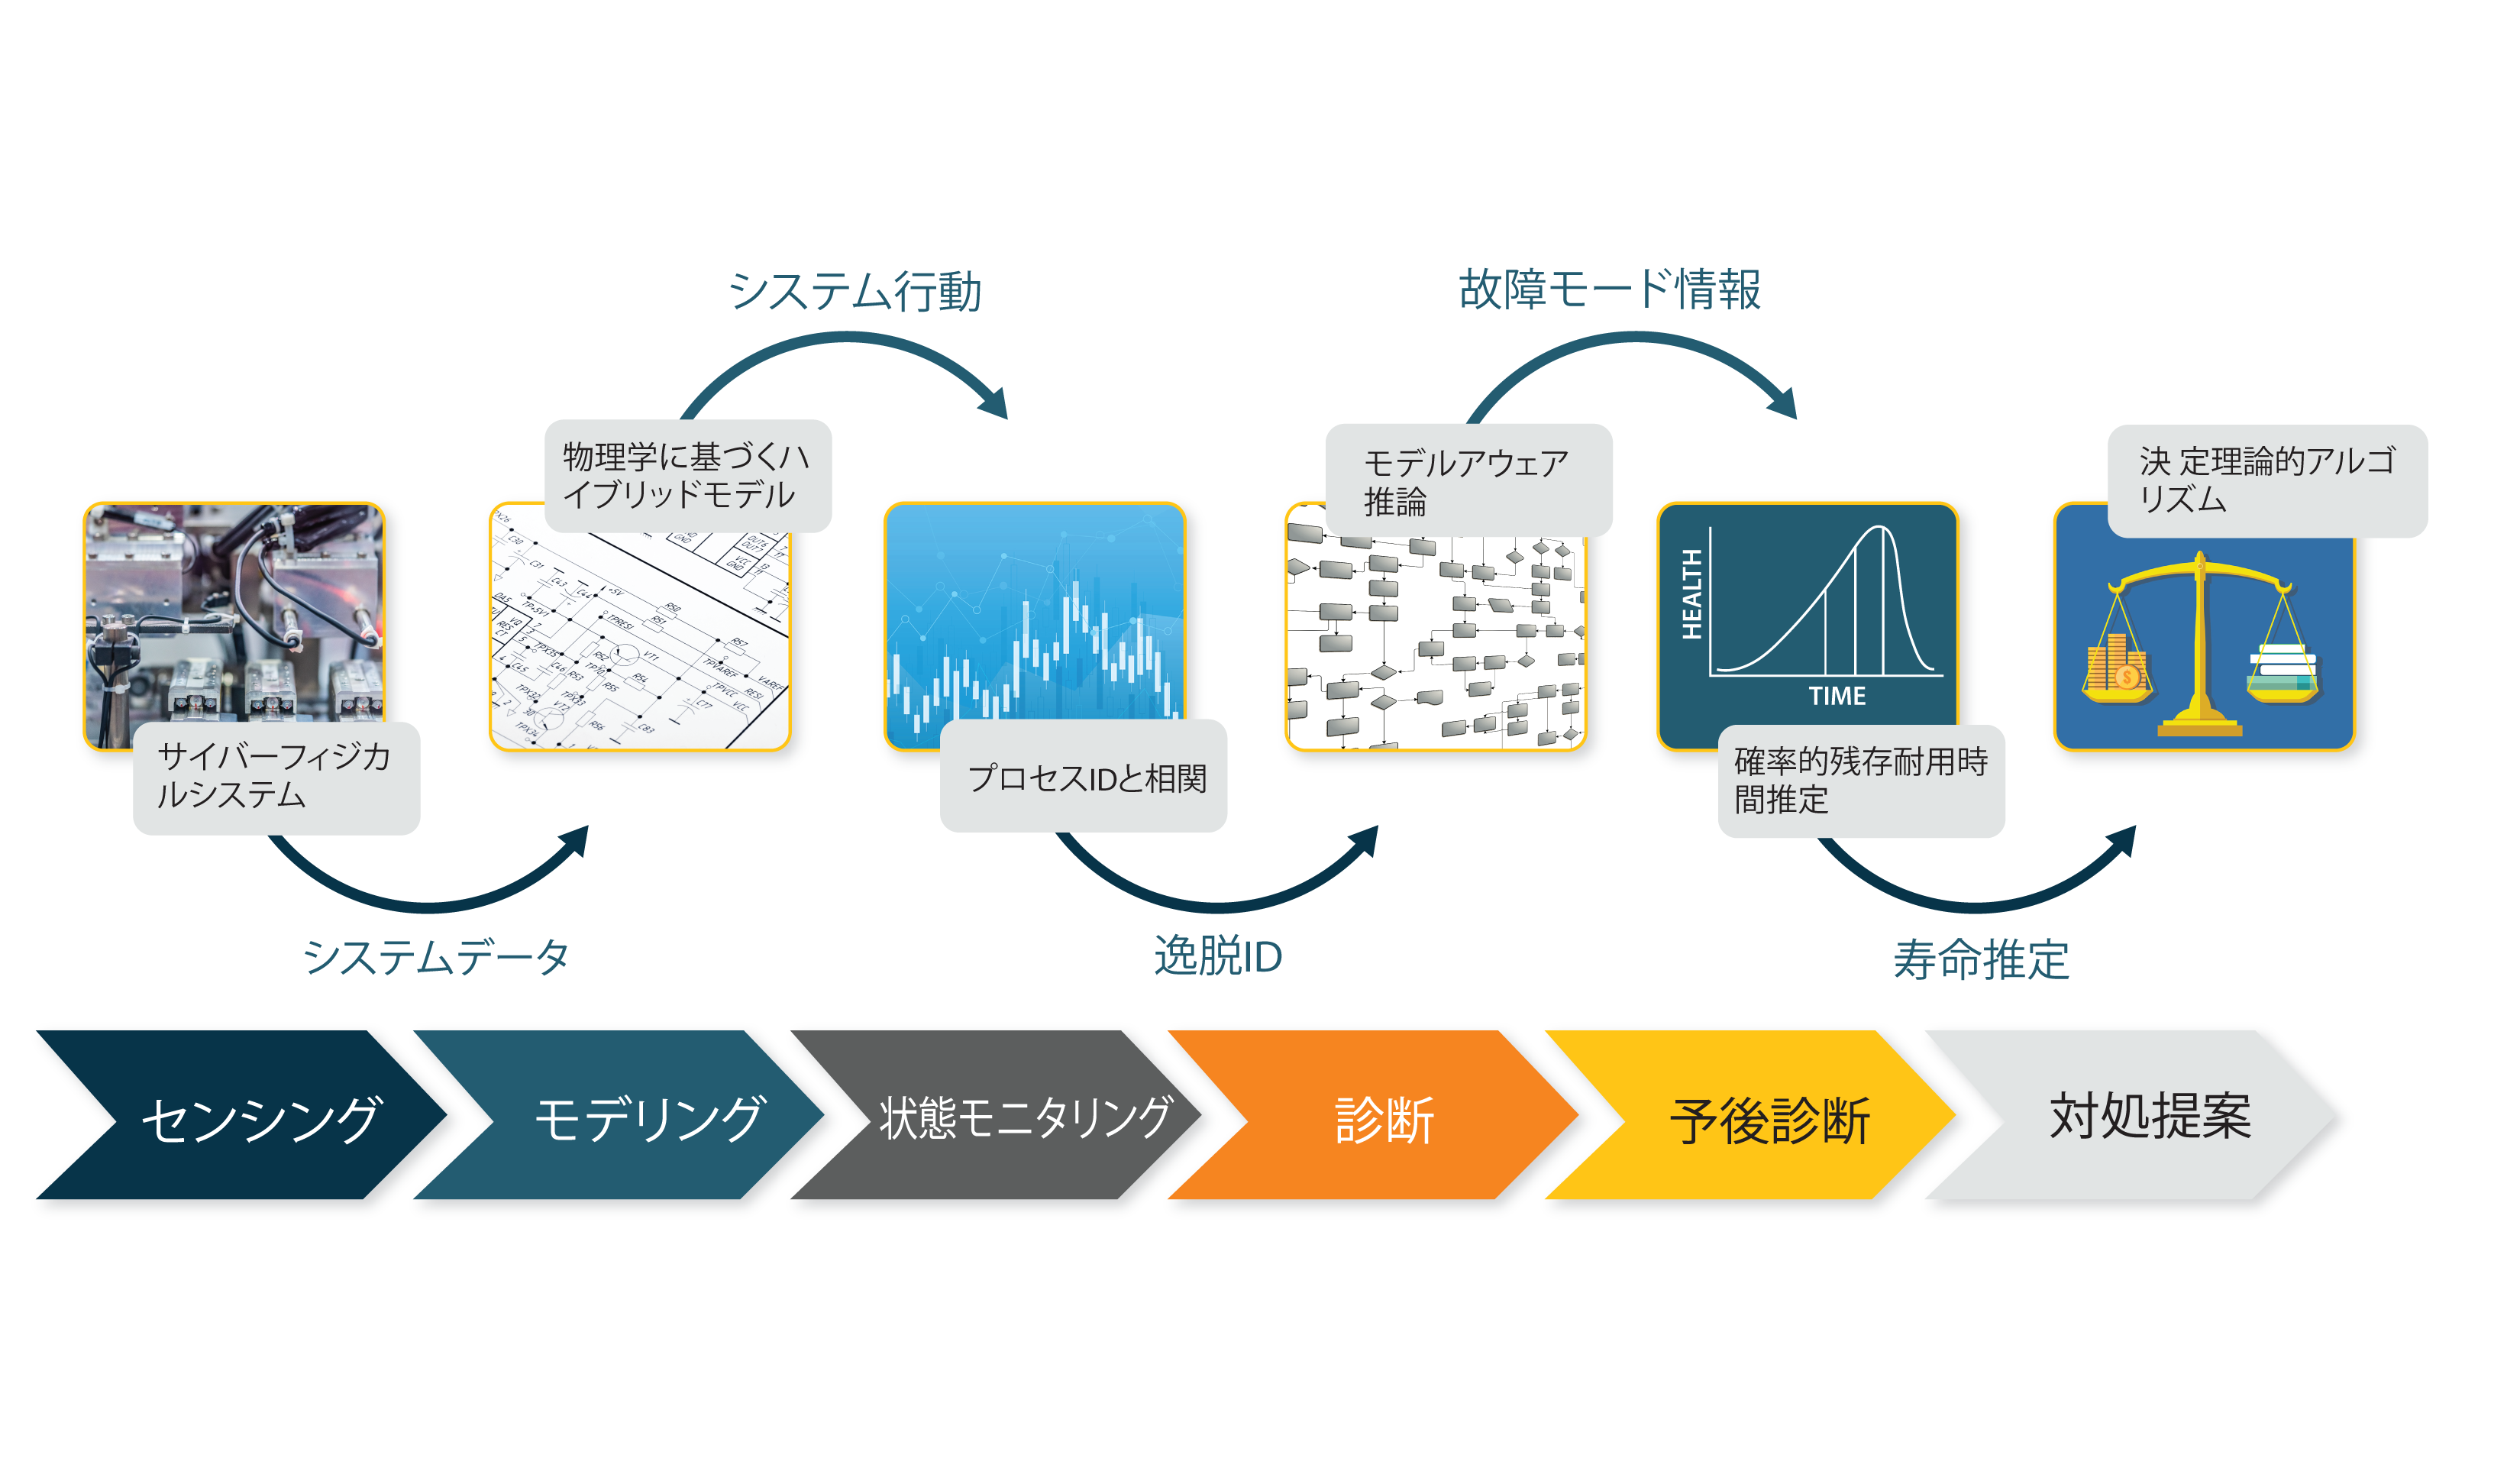 PARC System Behaviors Chart Japanese